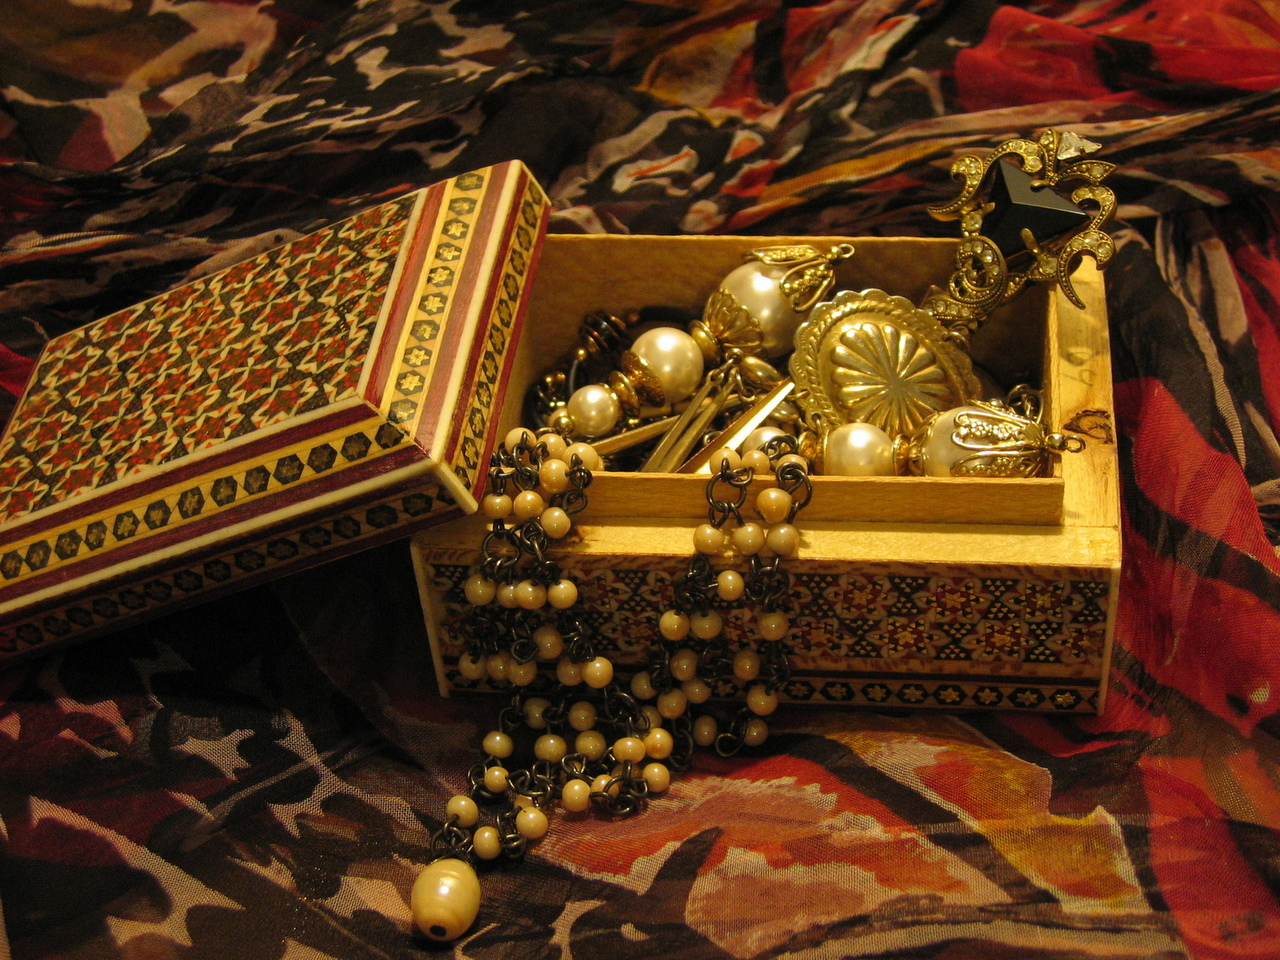 oriental-jewel-case-1422704-1280x960.jpg